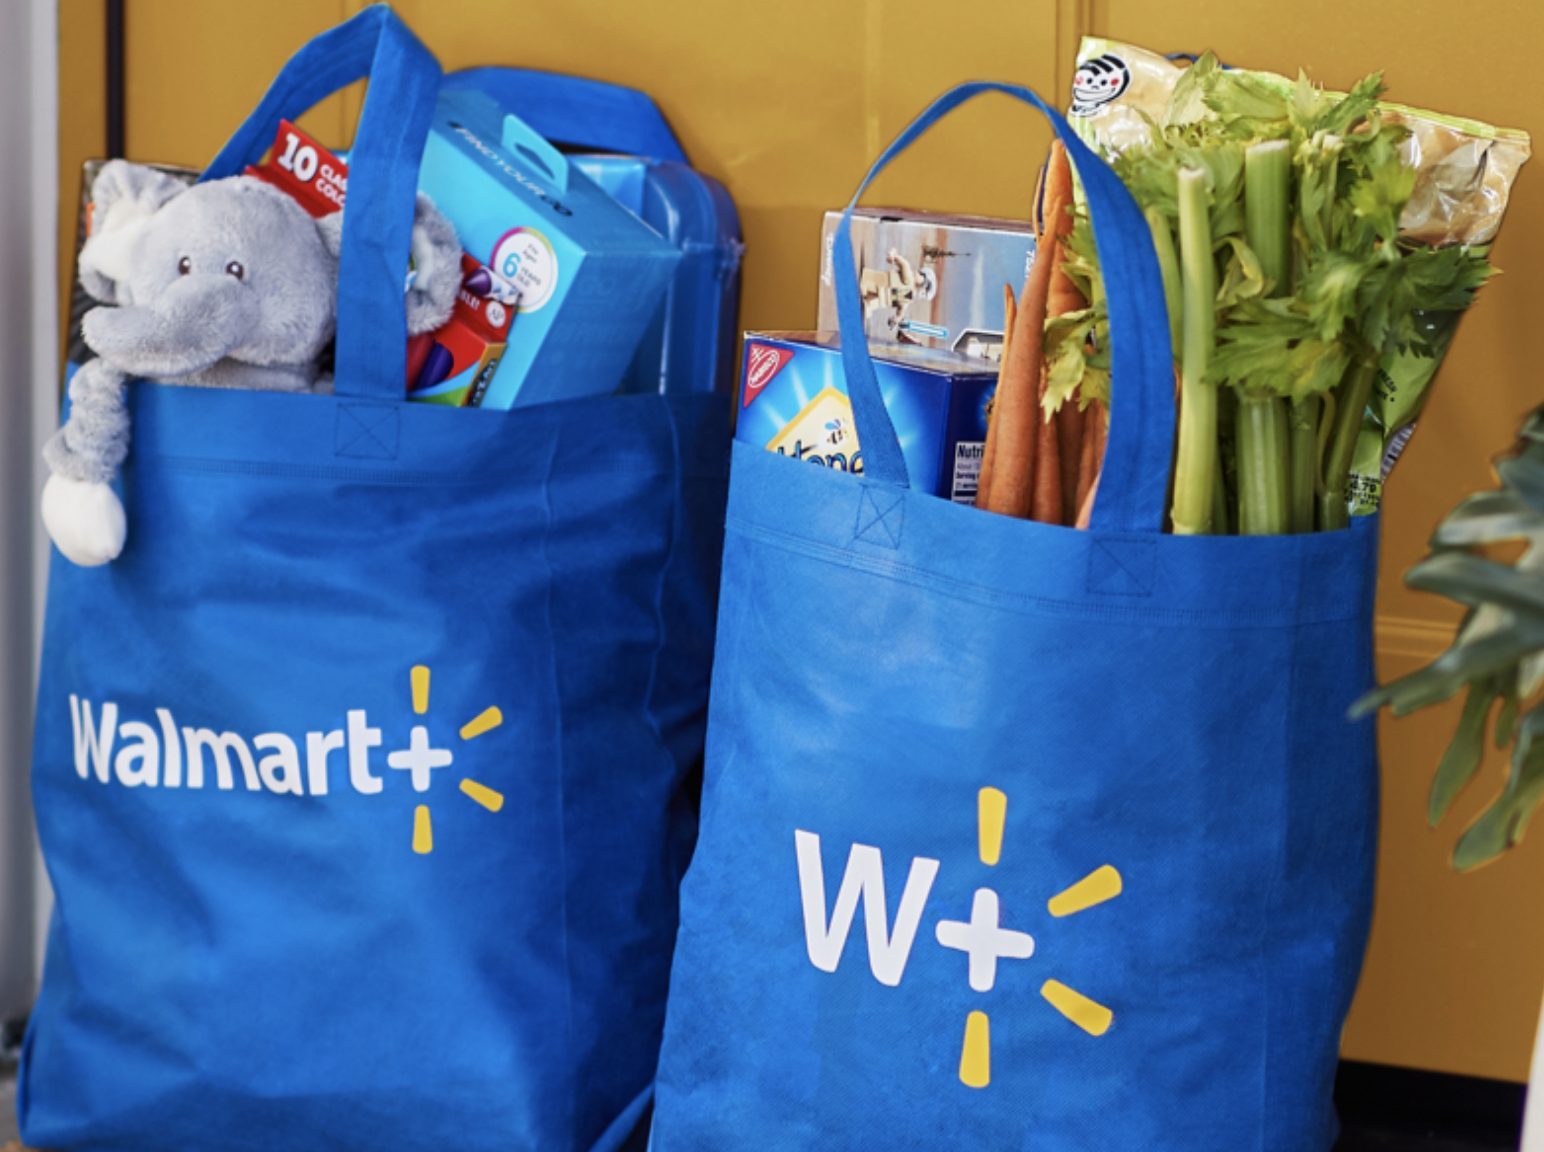 Walmart+ Goes Head To Head With Amazon